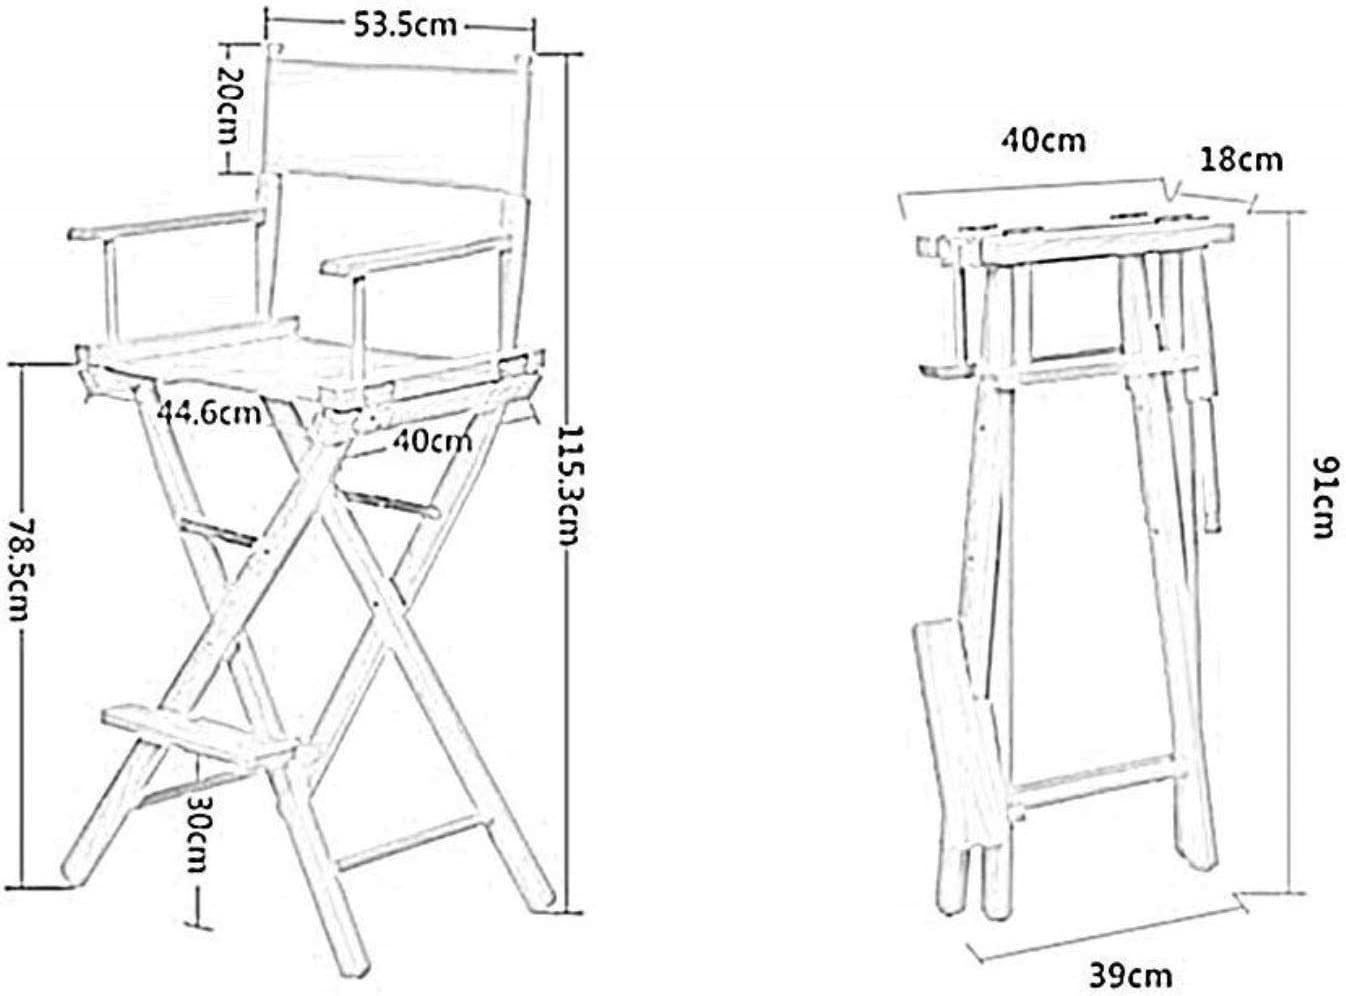 GAOLILI Chaise Chaise en Bois Massif Pliable Haut Tabouret Toile Assise et Dossier Armrests- for Office Loisirs Make Up Outdoor Pêche 8 Couleurs (Color : F) H